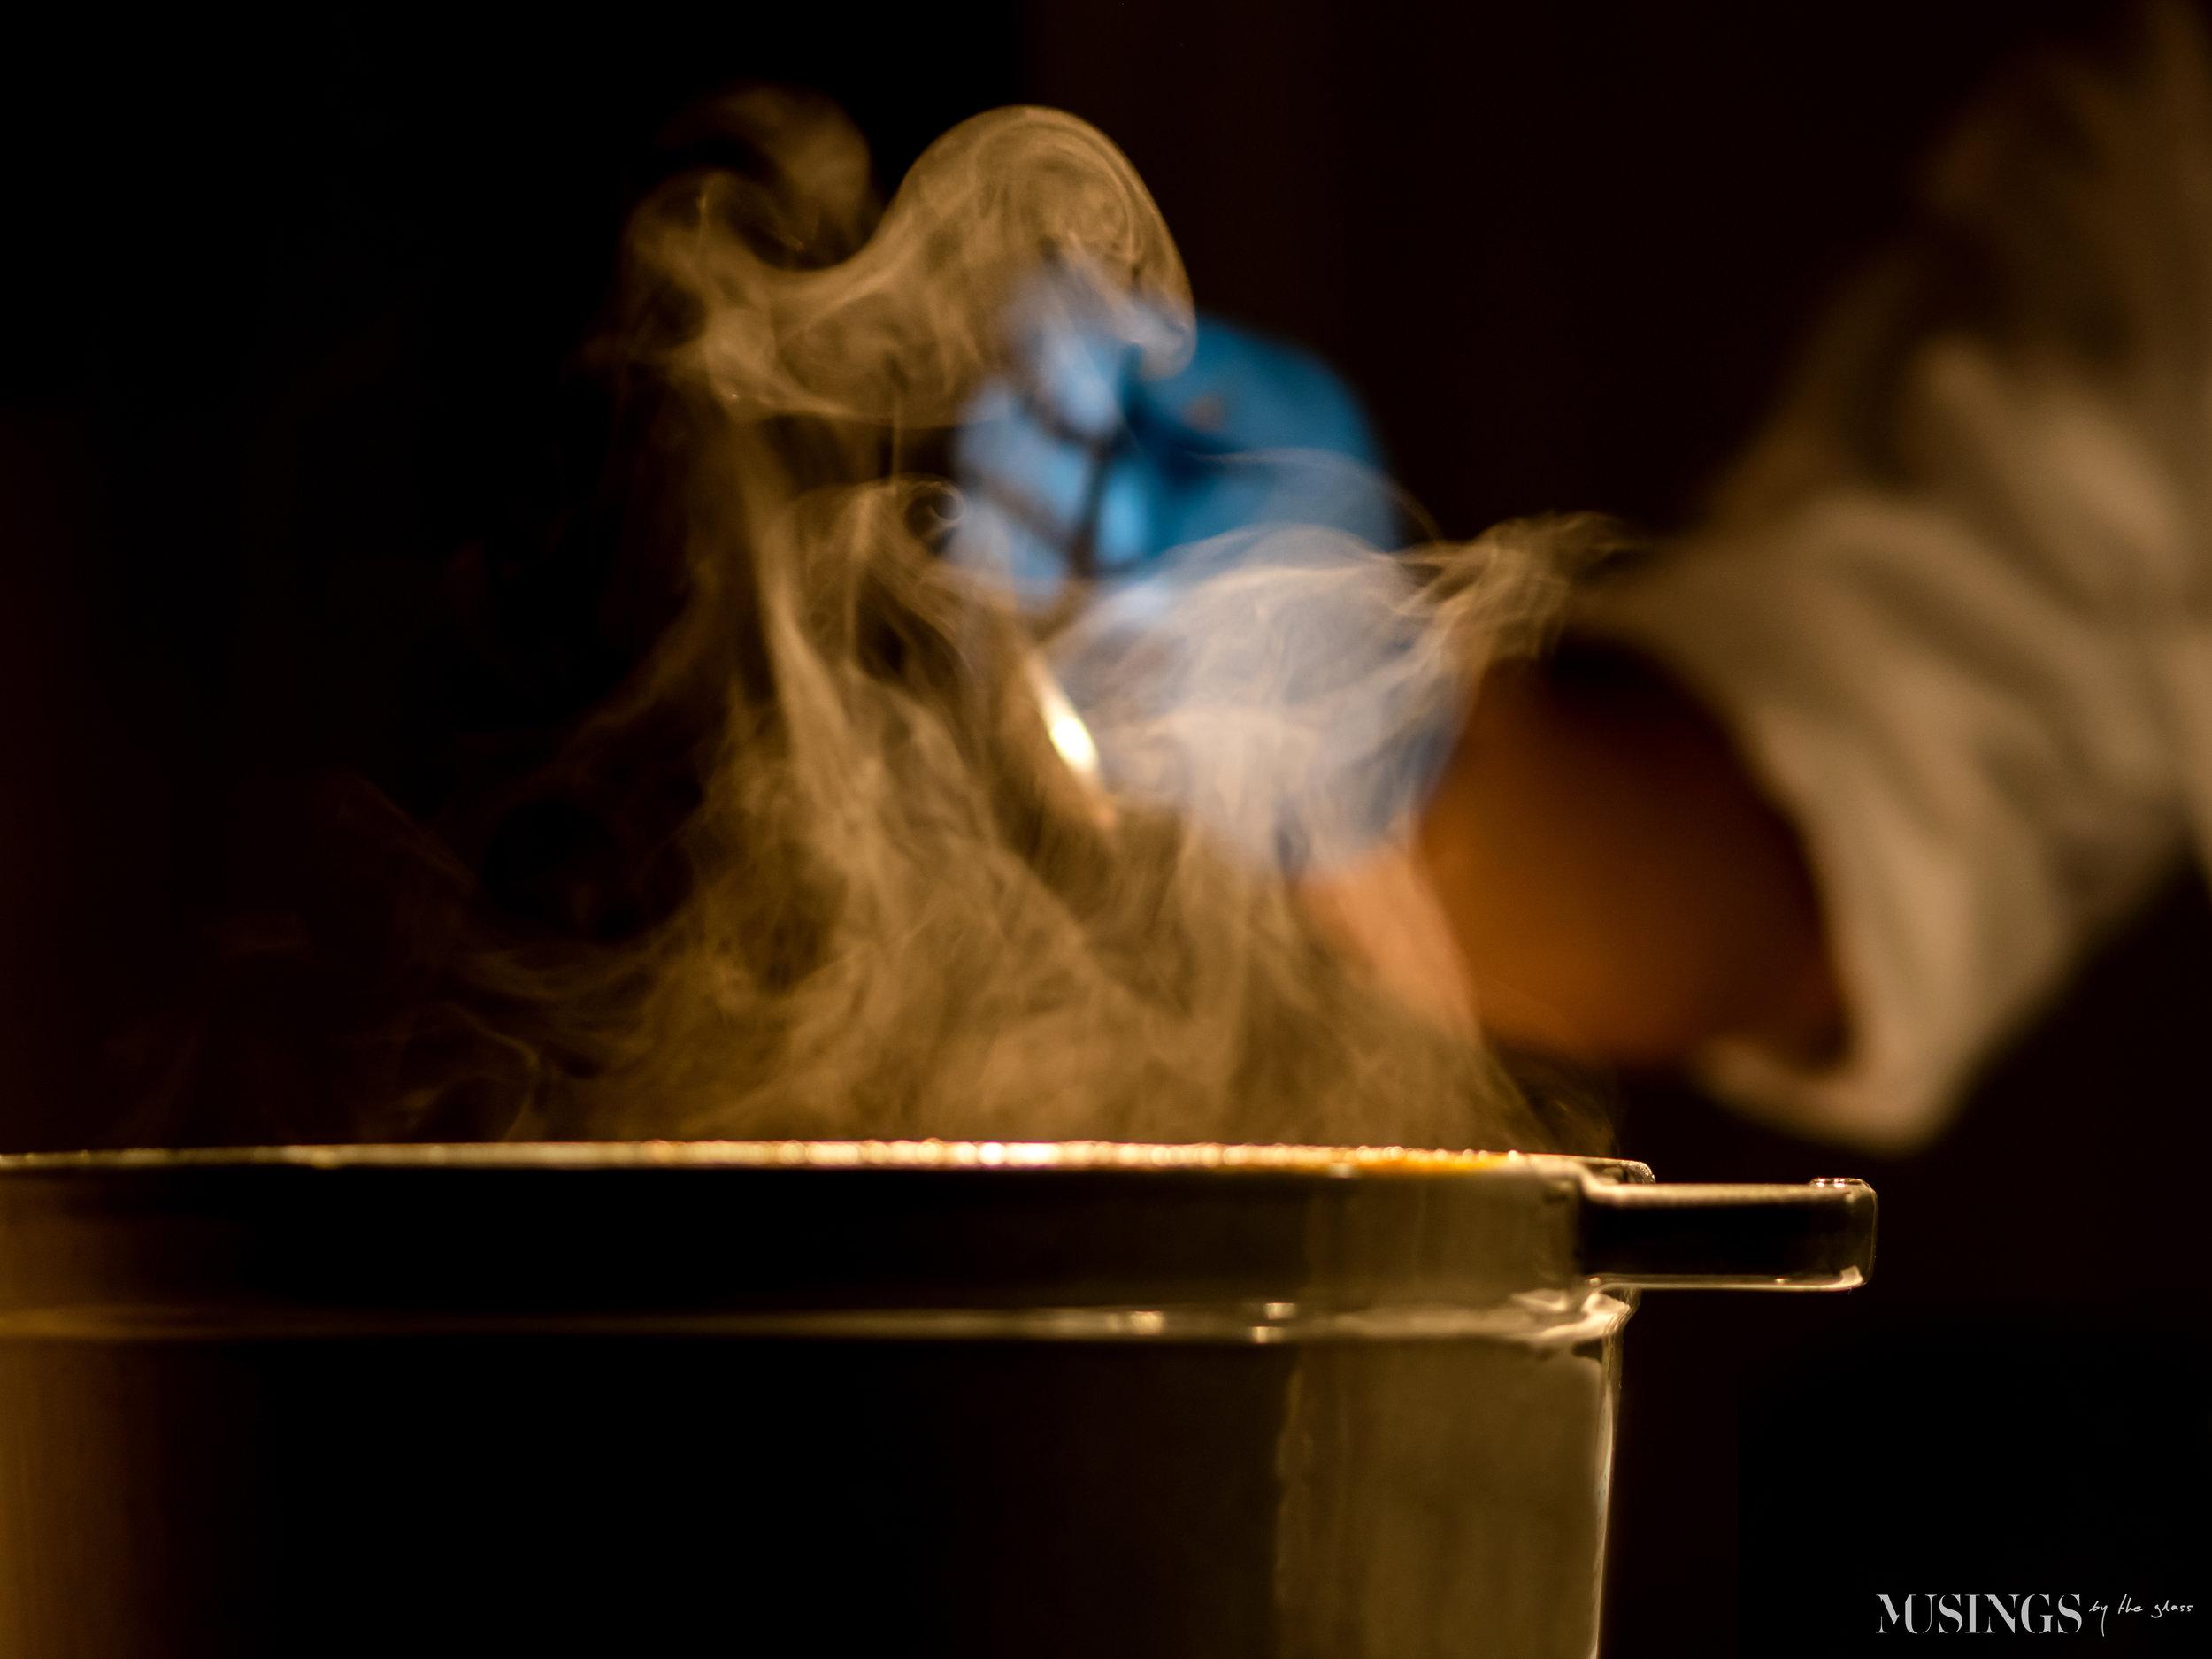 Cauldron of Intrigue